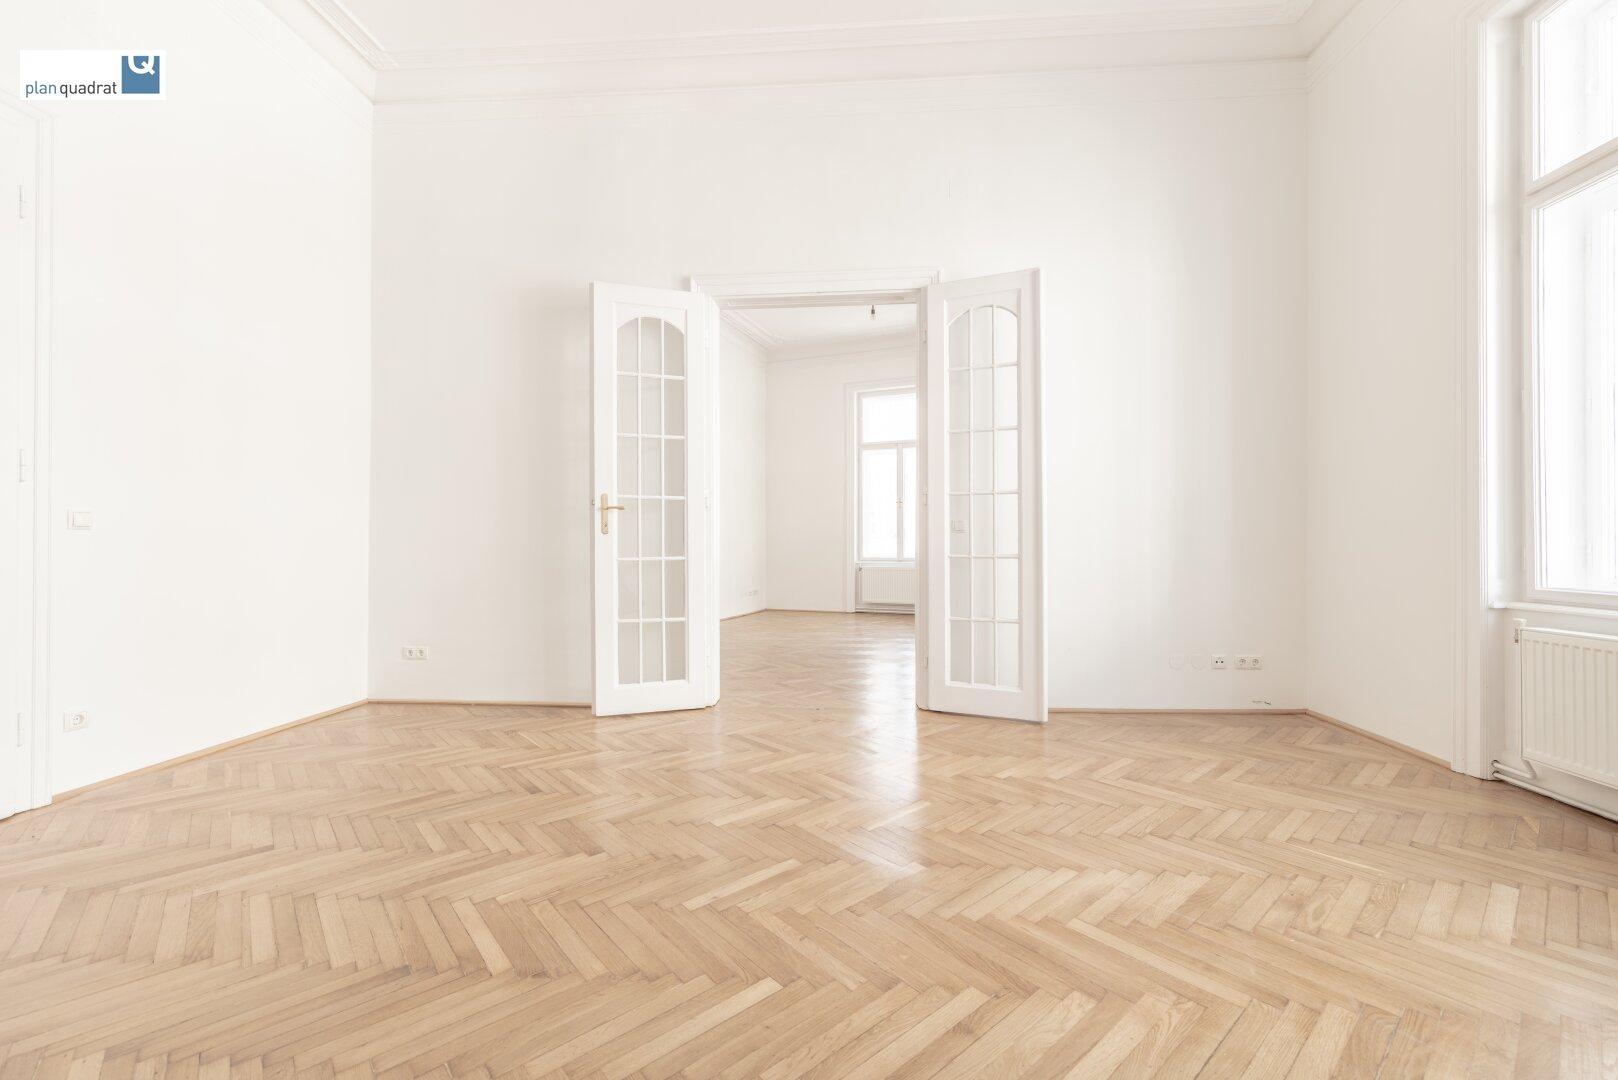 Raum 6 (gem. Grunsrissskizze - ca. 26,40 qm)